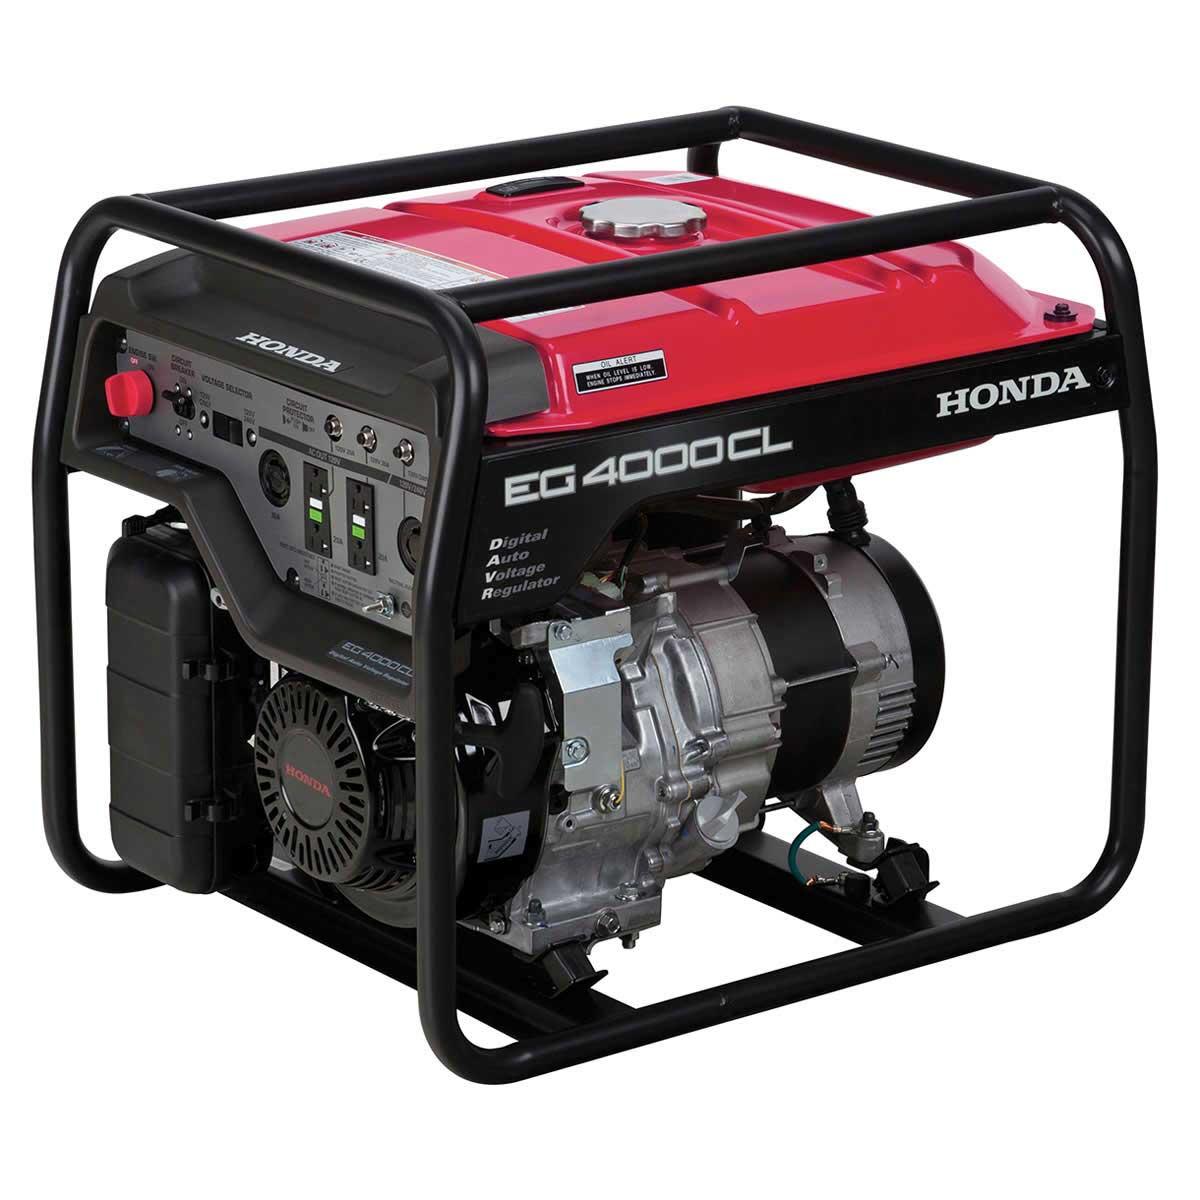 Honda Generator EG4000